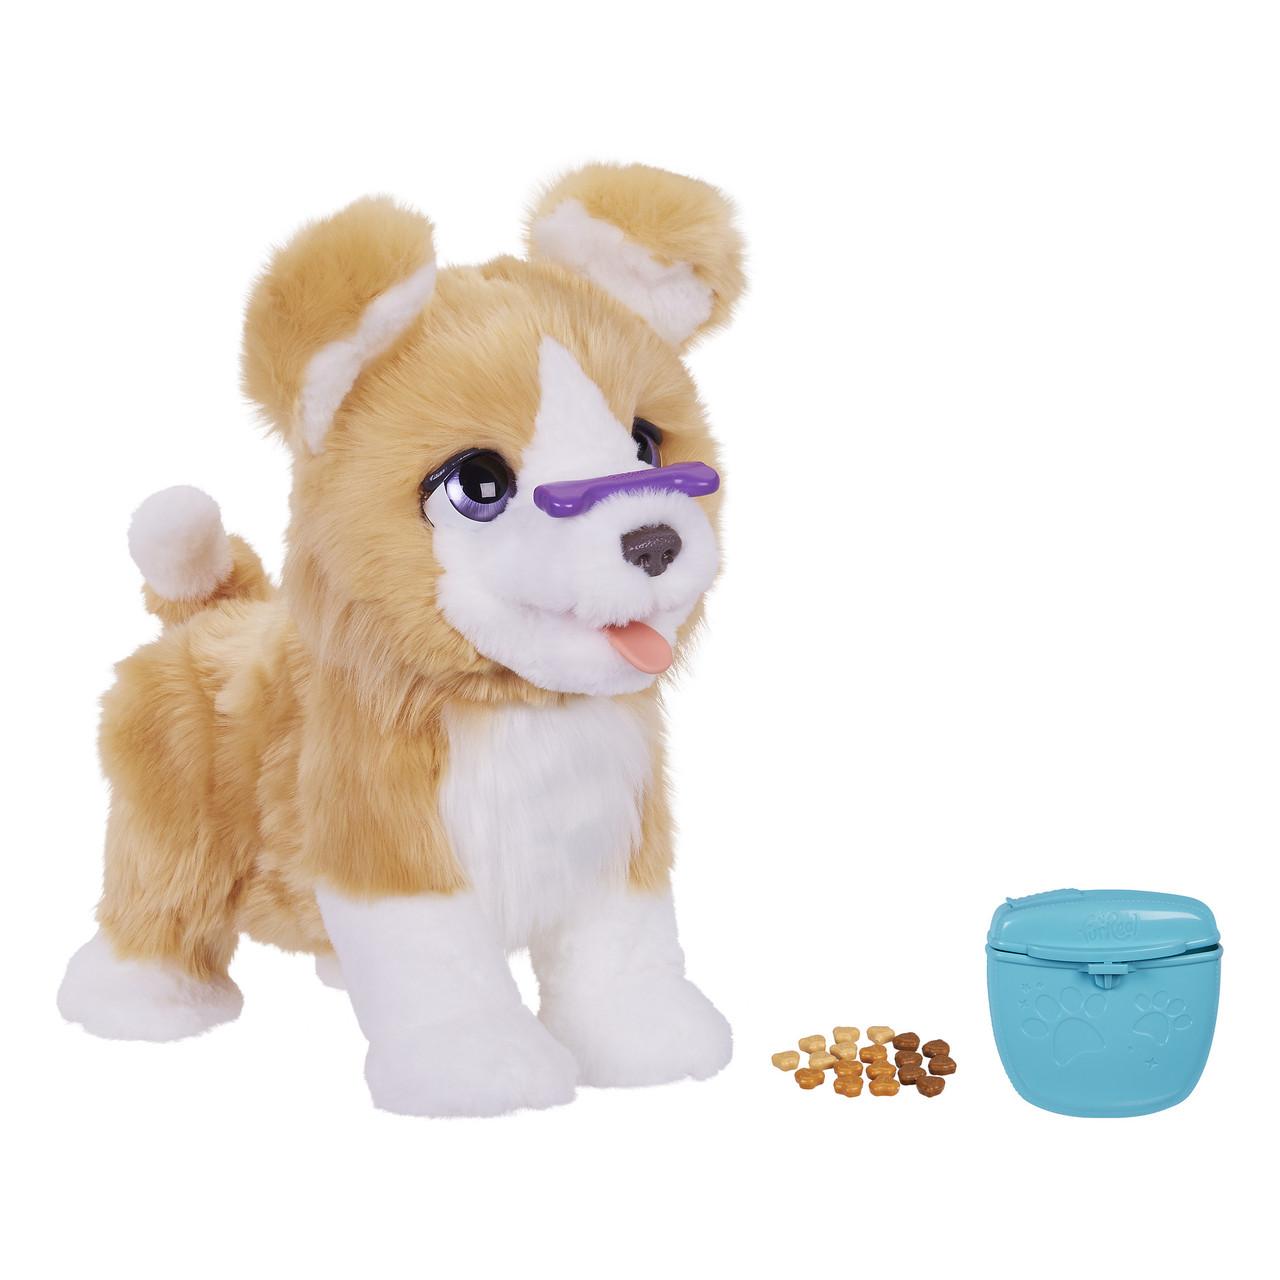 FurReal Friends Интерактивная игрушка щенок Лекси Lexie Pet the Trick-Lovin' Pup